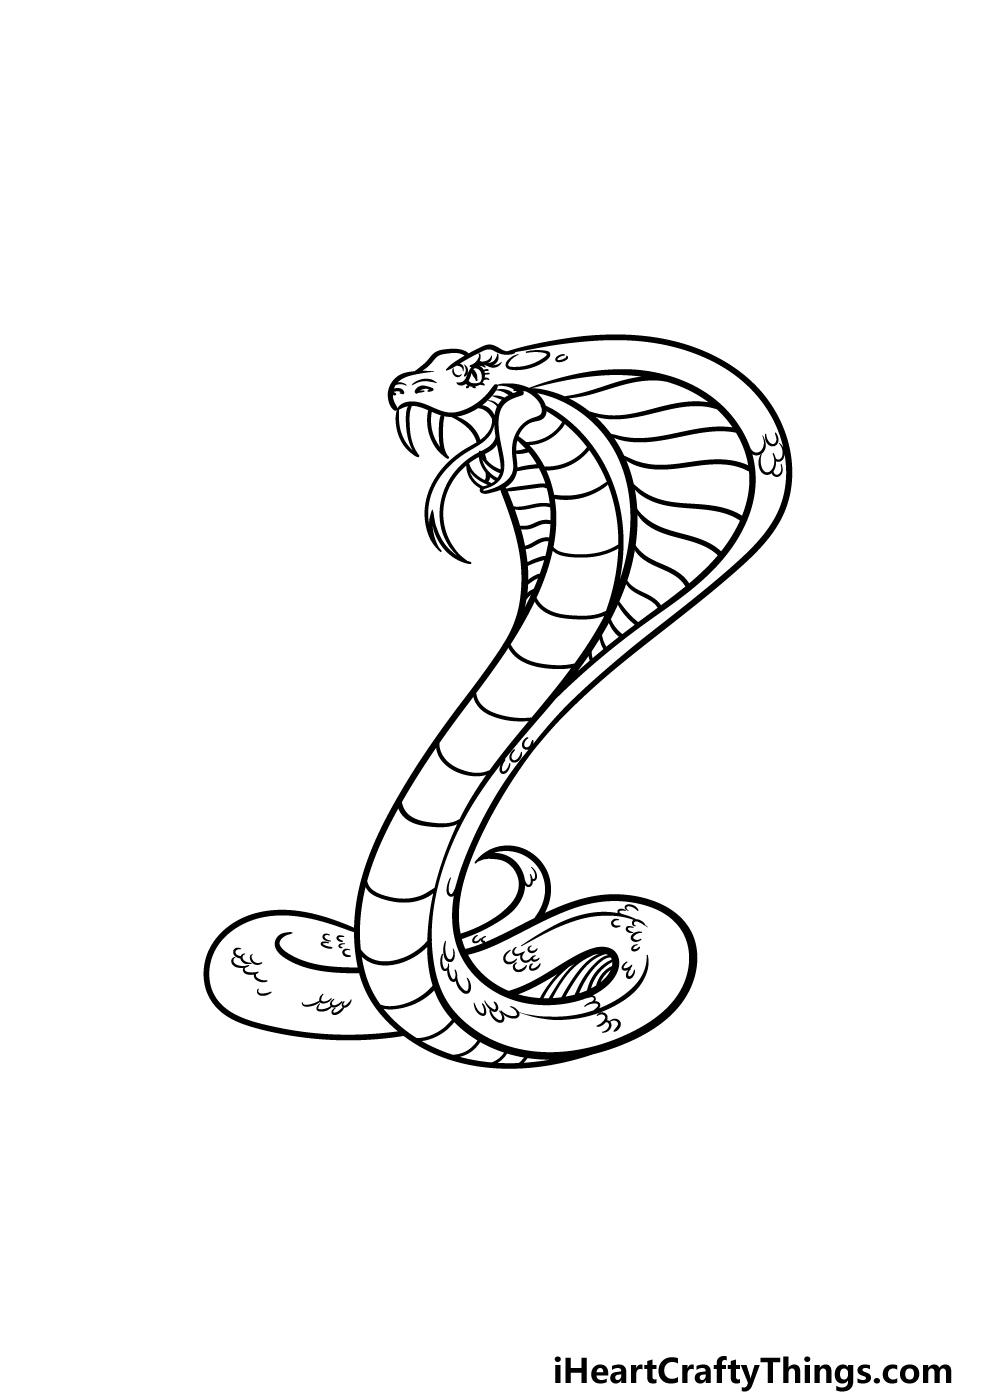 drawing cobra step 5